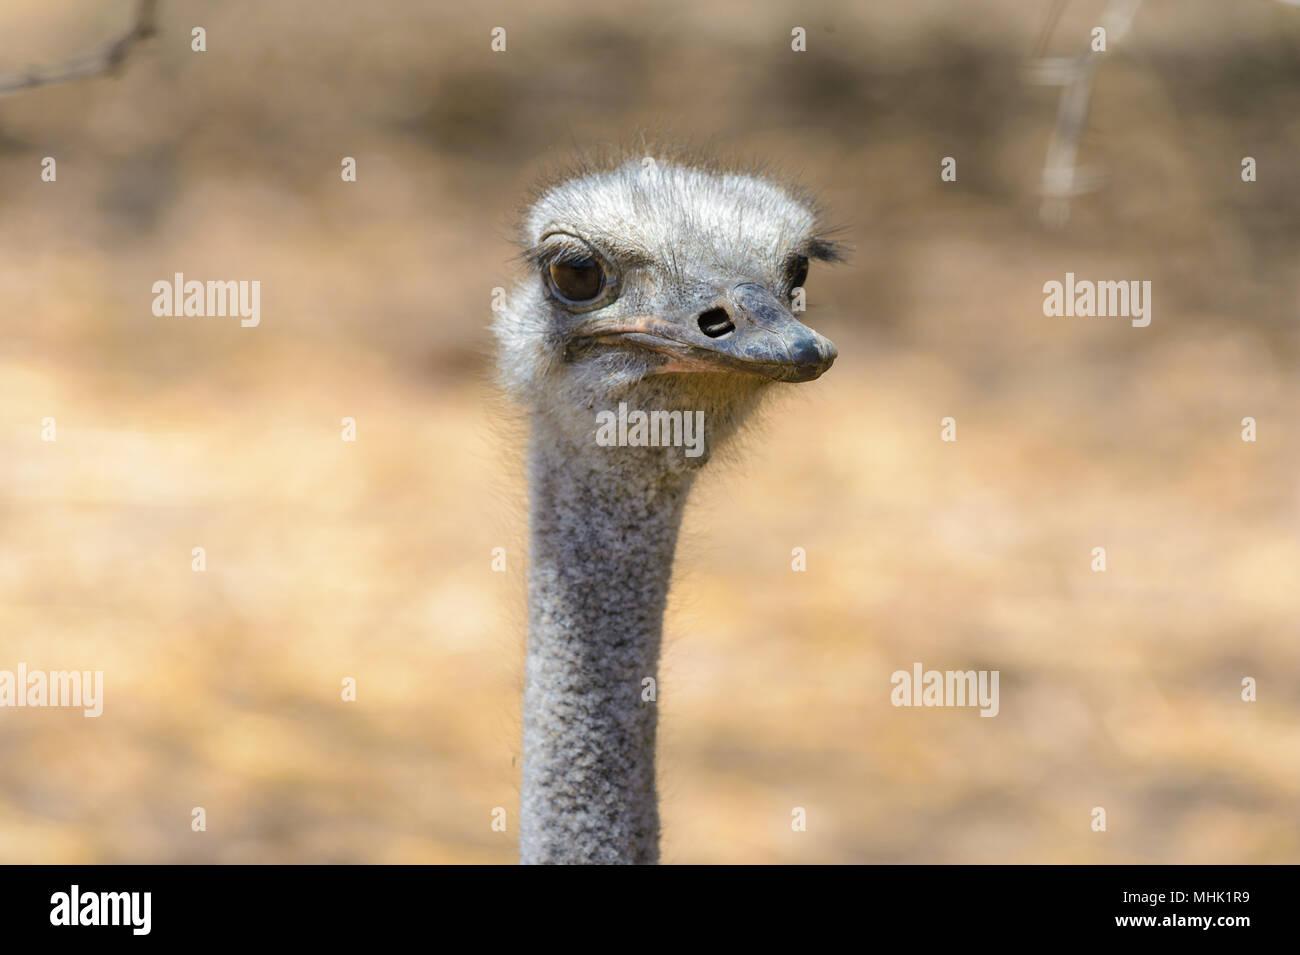 Head a brainless ostrich - Stock Image